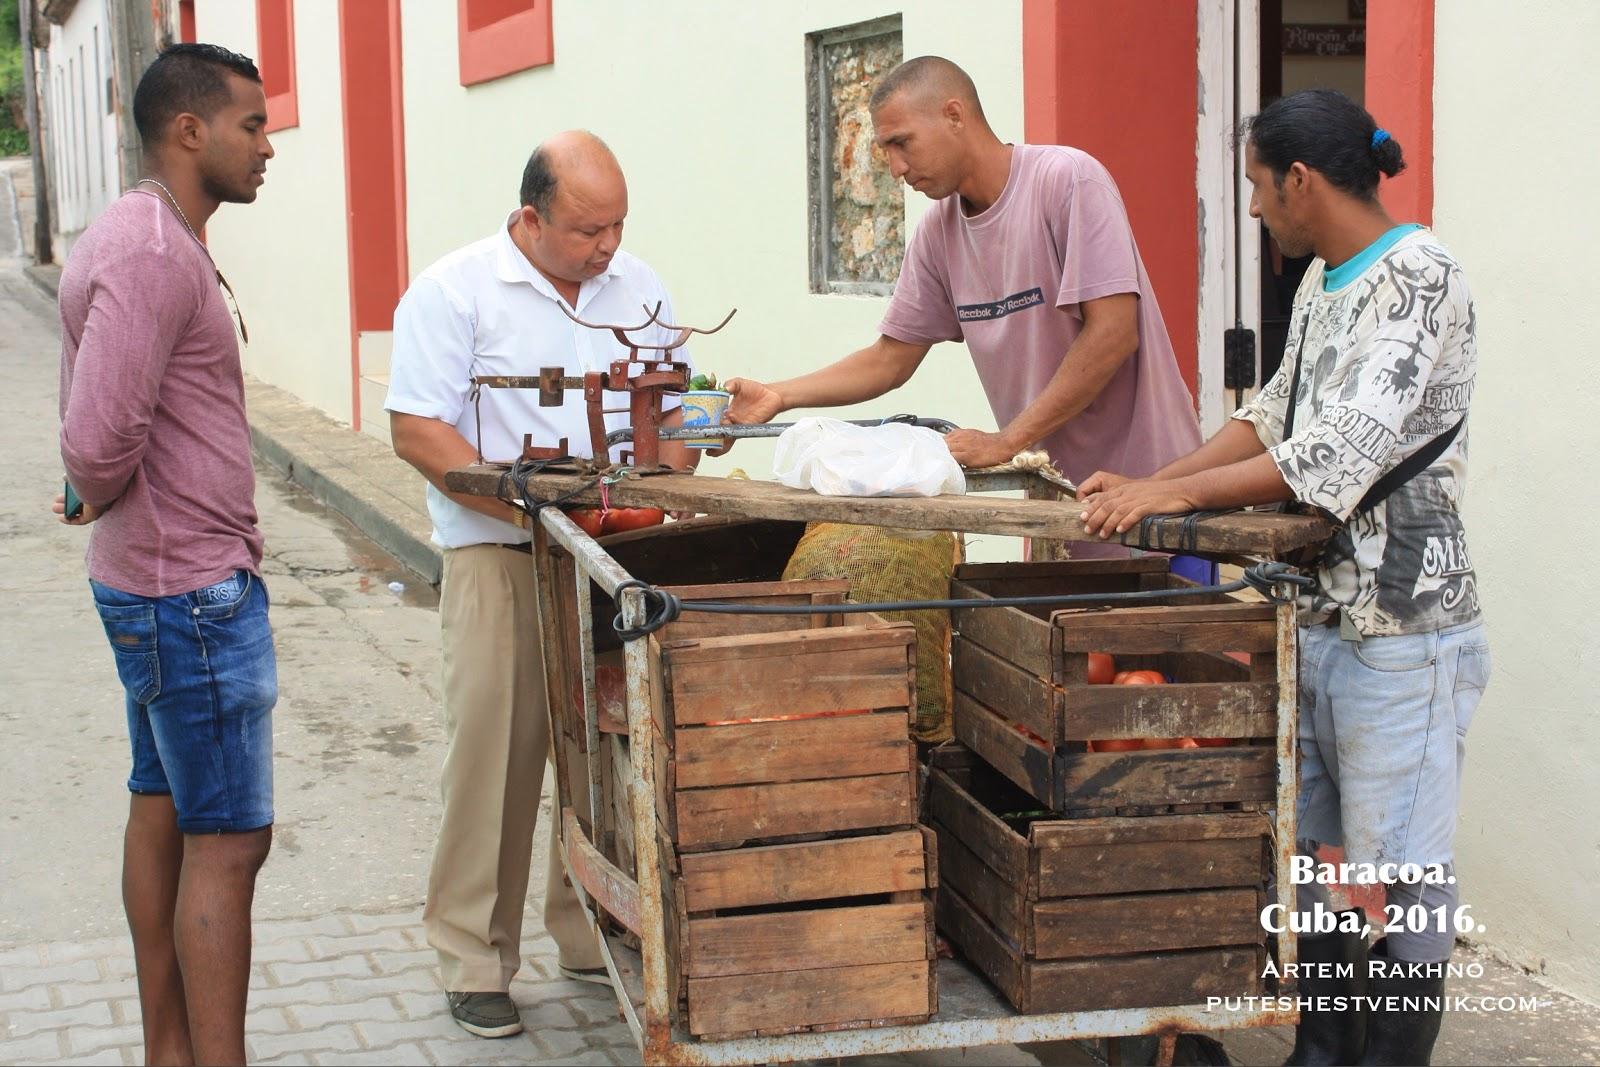 Торговля овощами на улице в Баракоа